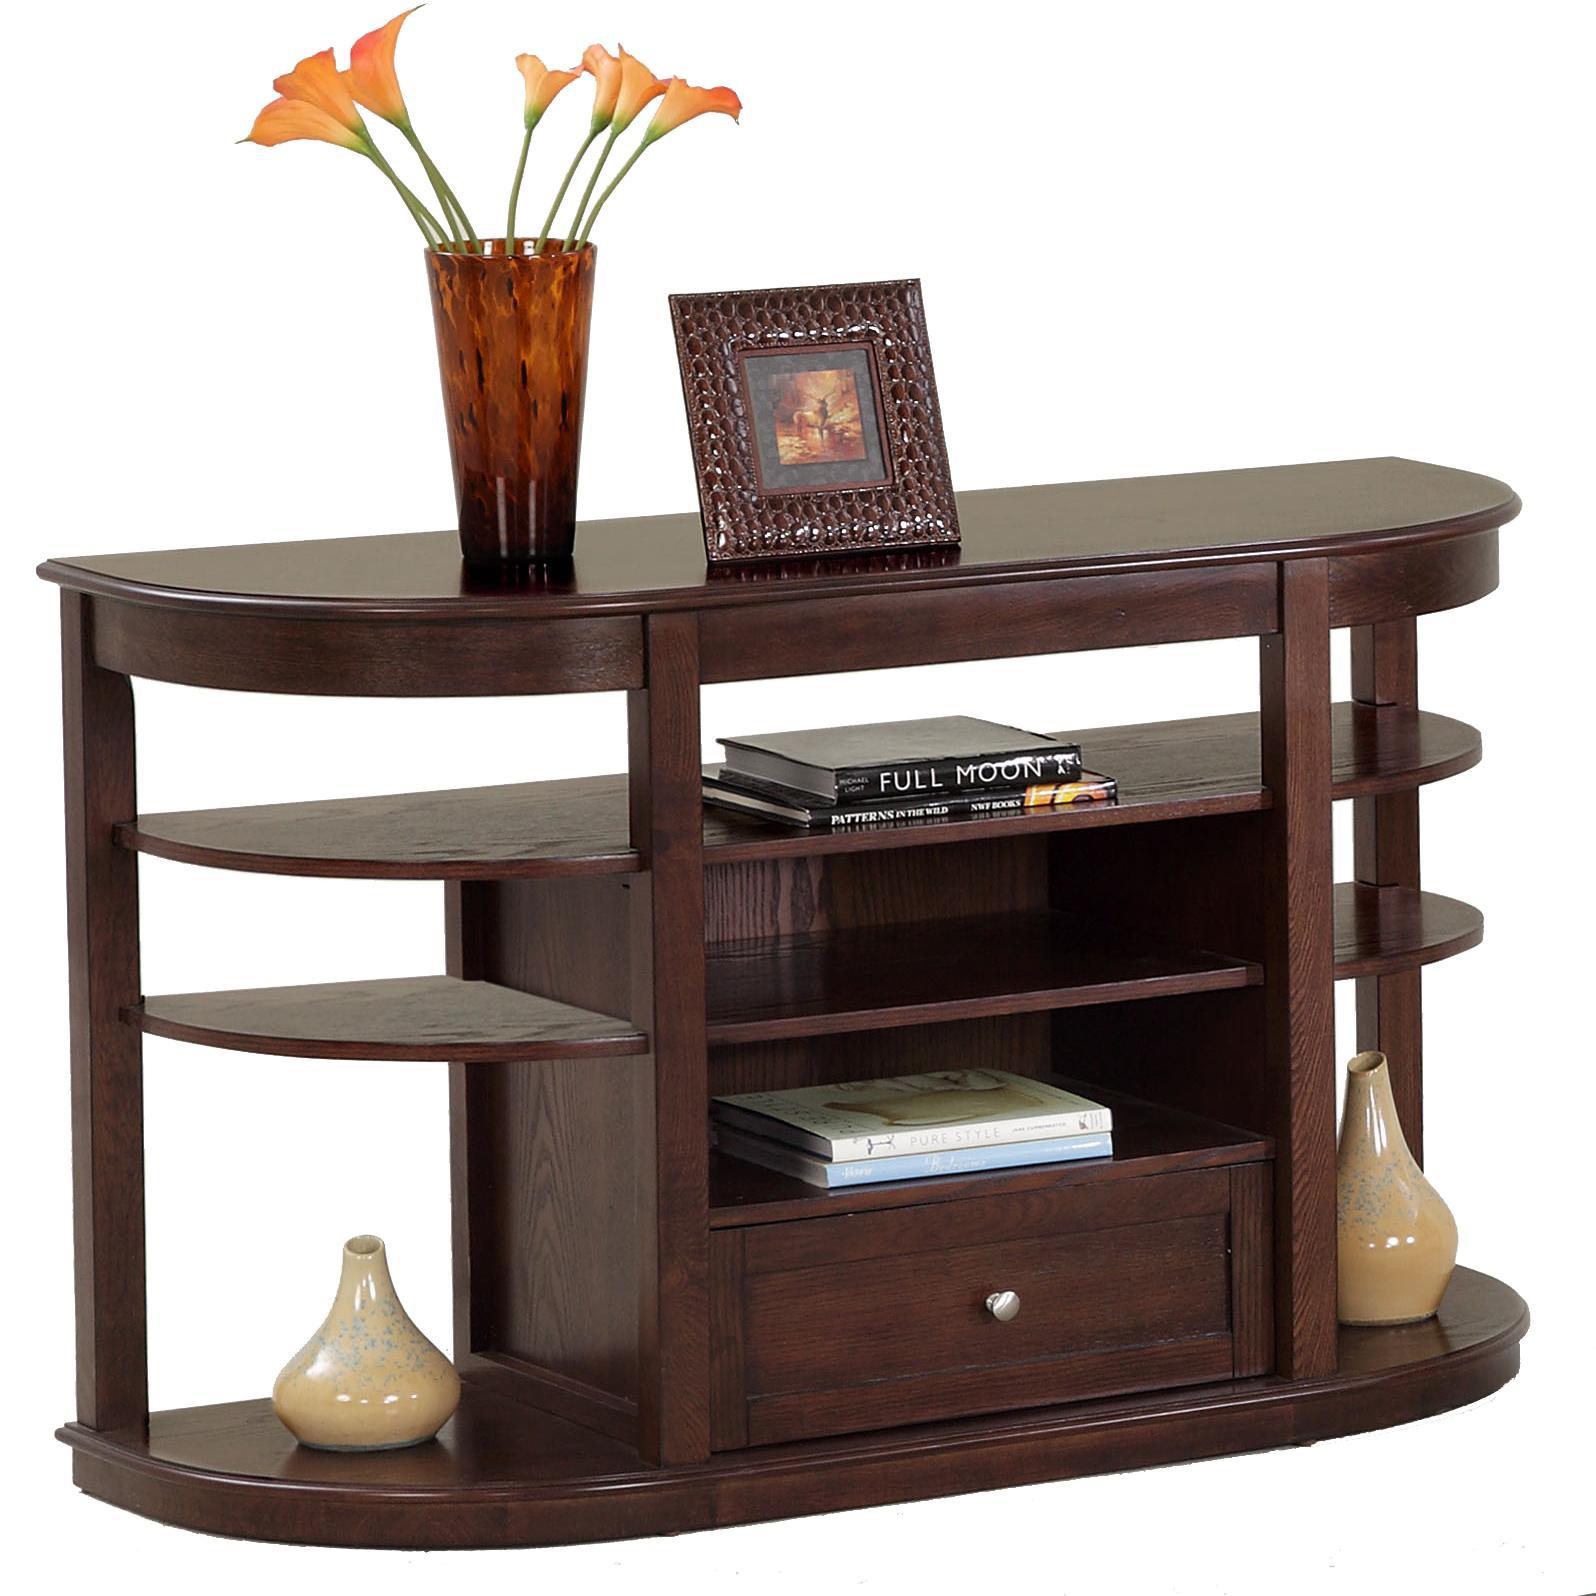 Progressive furniture sebring sofa console table wayside for Sofa console